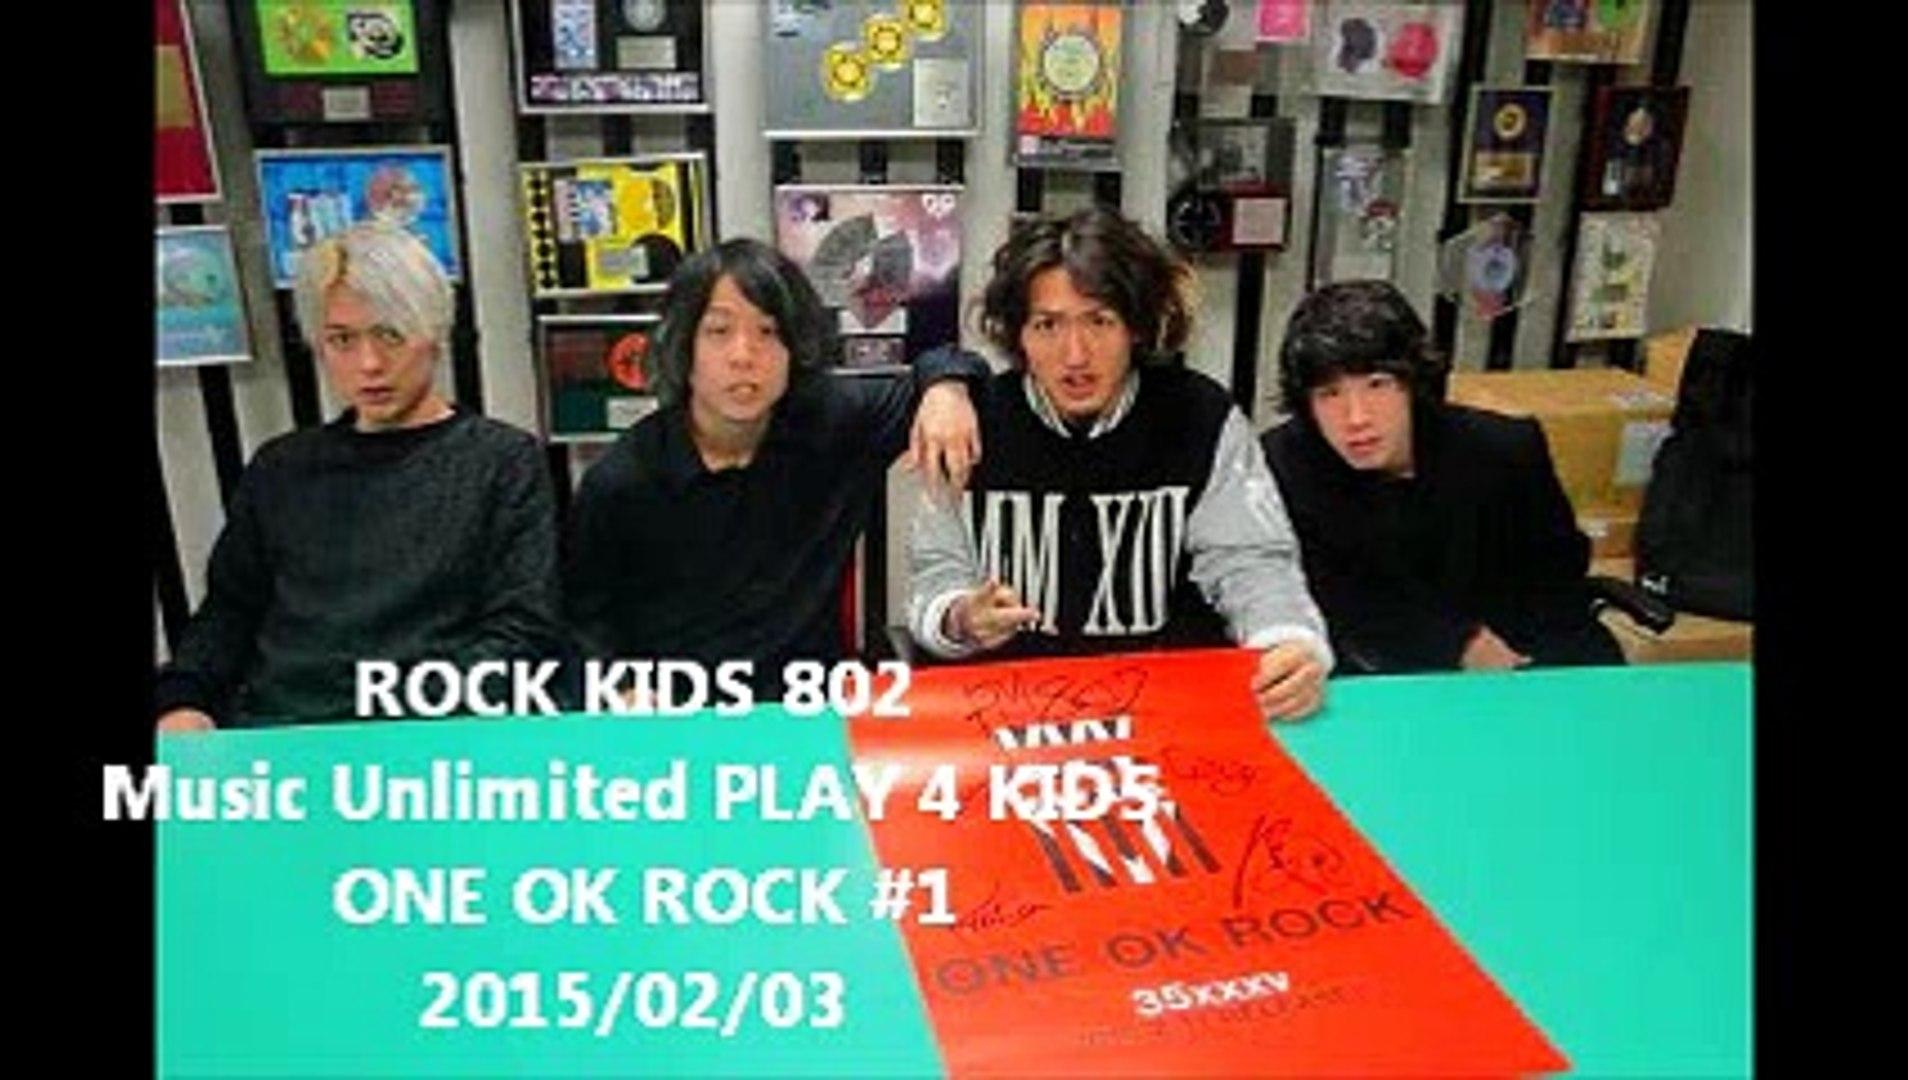 ROCK KIDS 802  PLAY 4 KIDS  ONE OK ROCK #1 2015/02/03